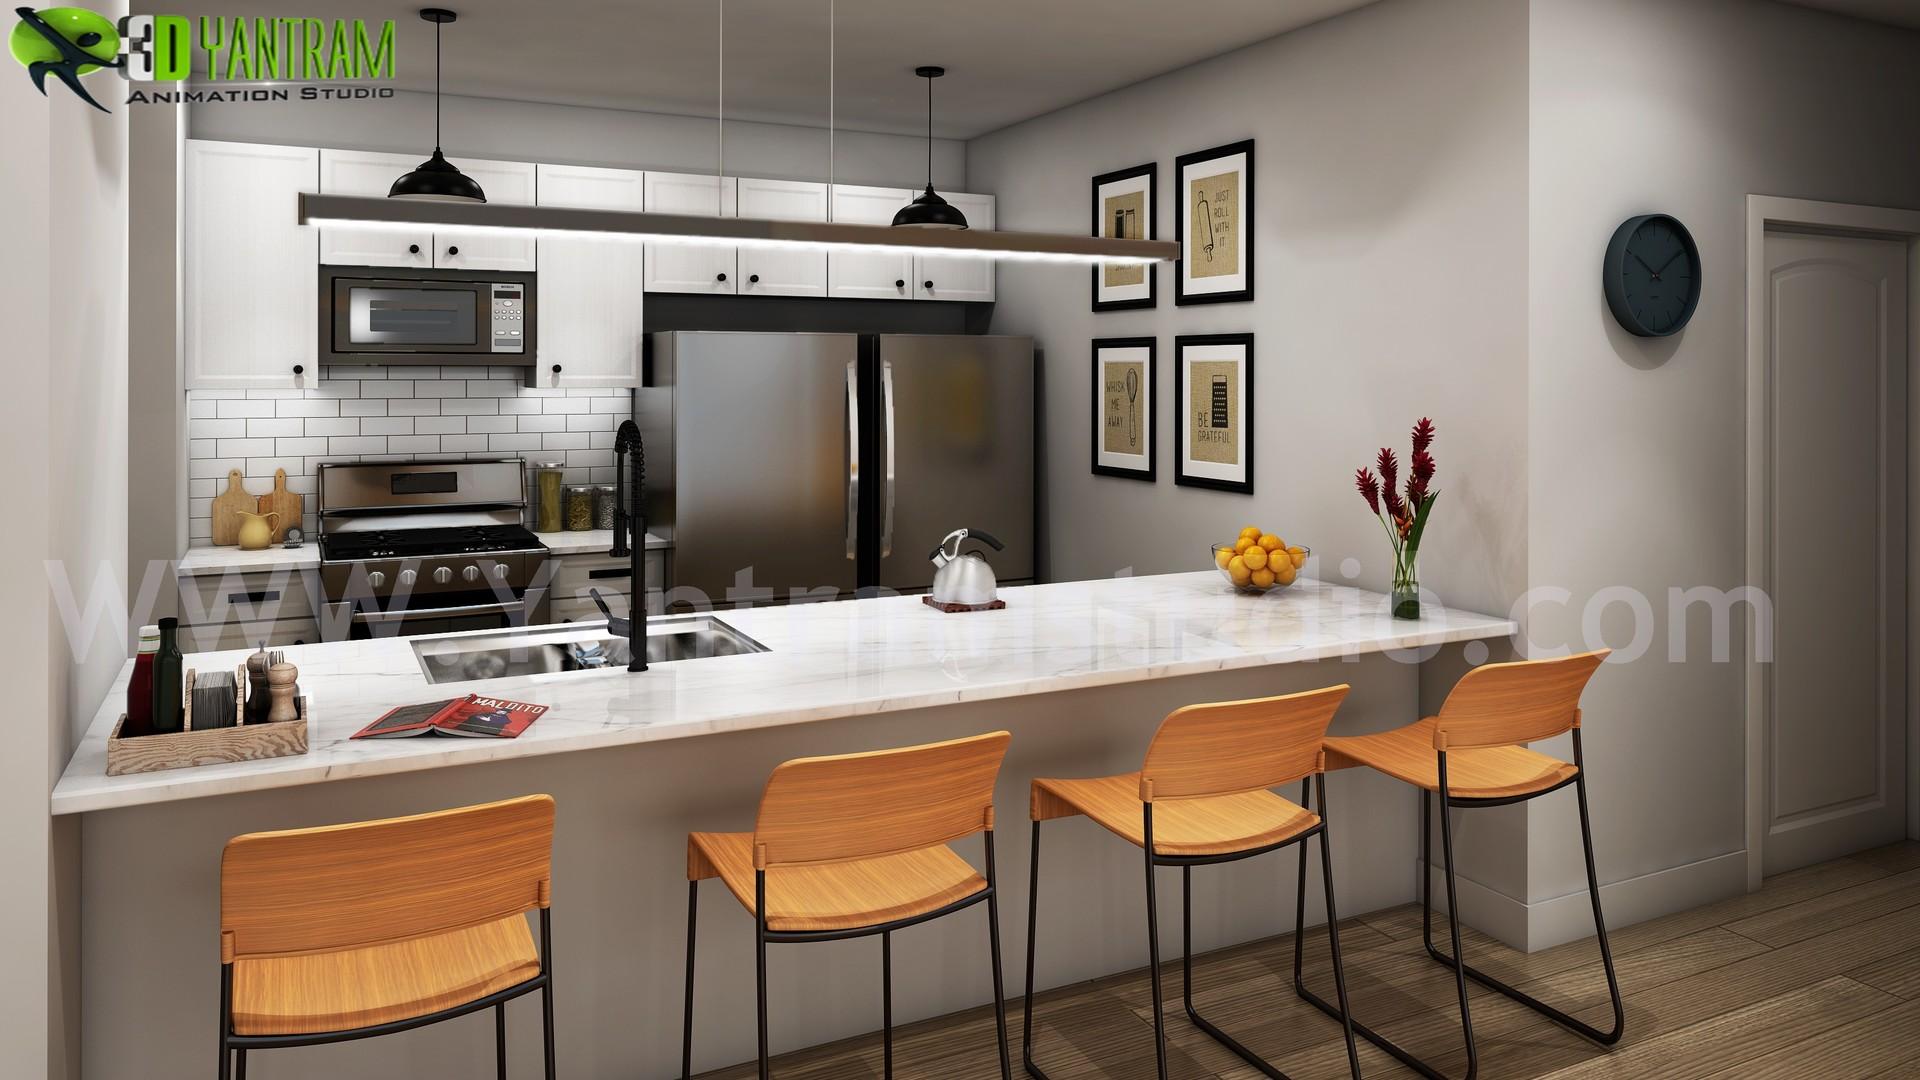 Yantram Architectural Design Studio Modern Small Kitchen Design Ideas By Yantram 3d Interior Rendering Services Berlin Germany